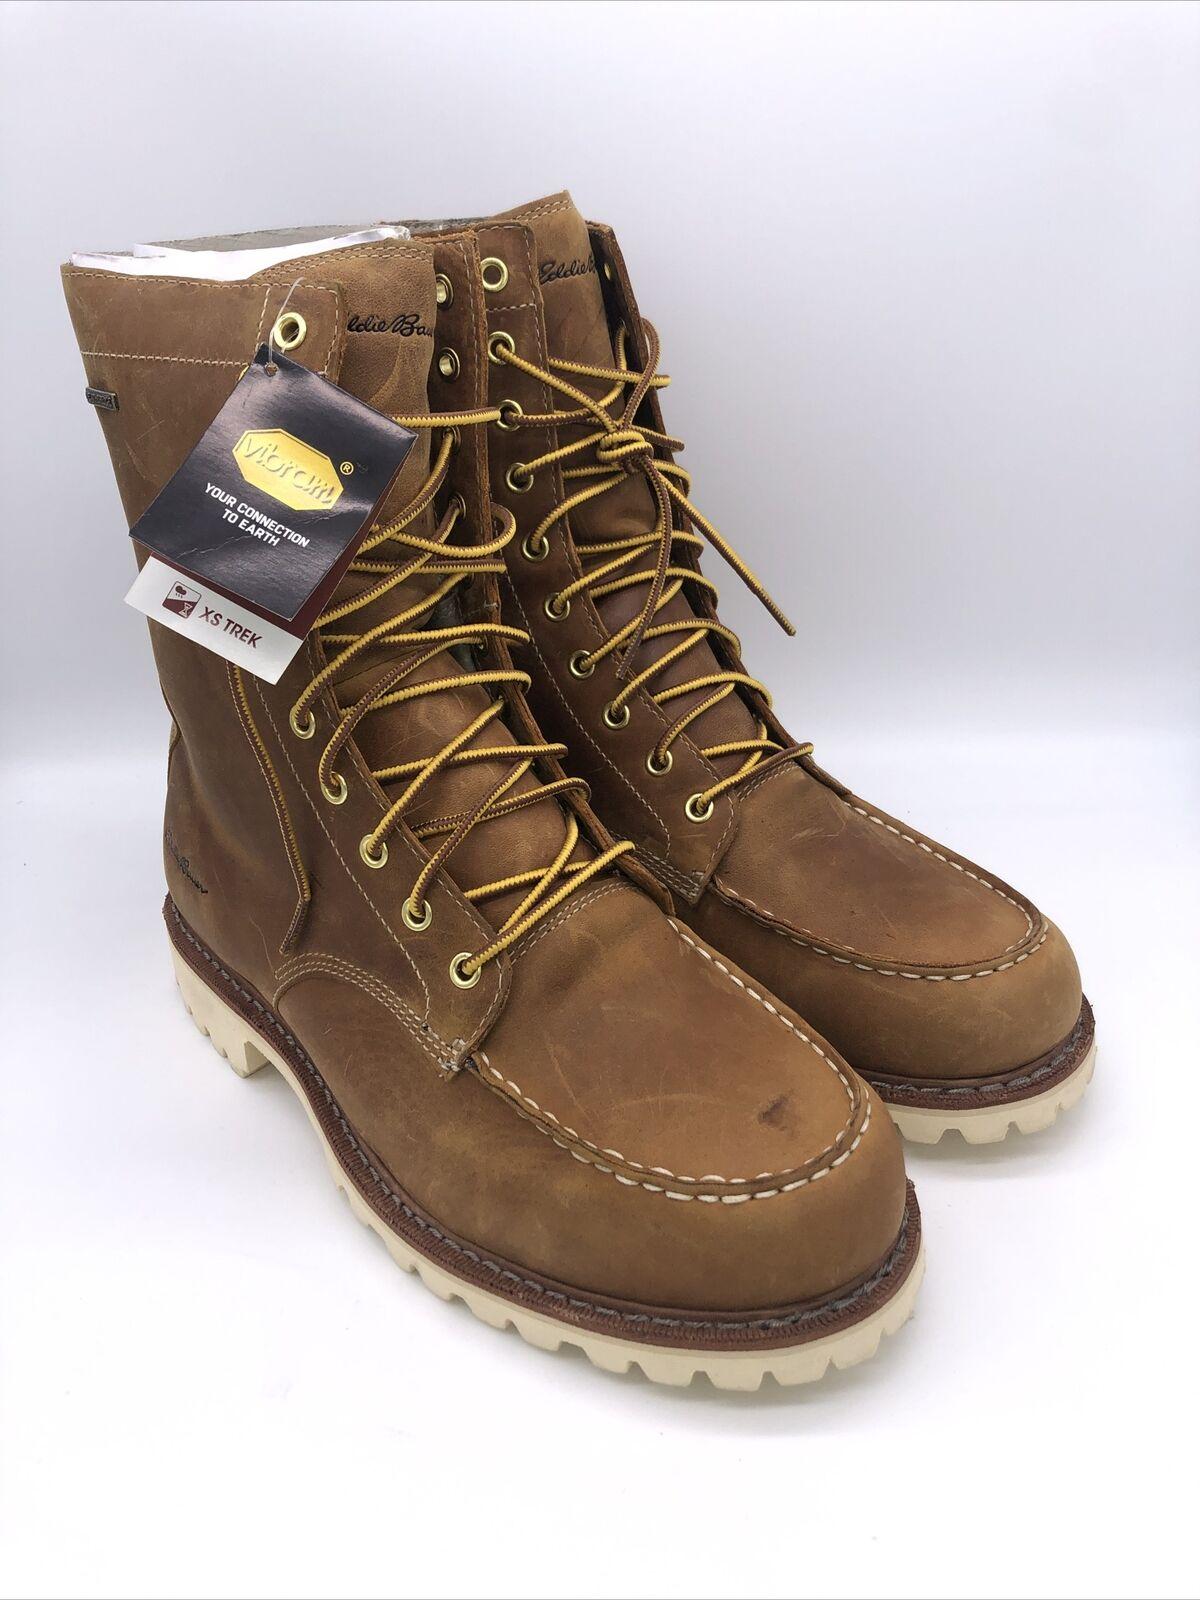 Eddie Bauer K-Series Men's Size 10 Tan Nubuck Leather 10 Eyelet Safety Toe Boots